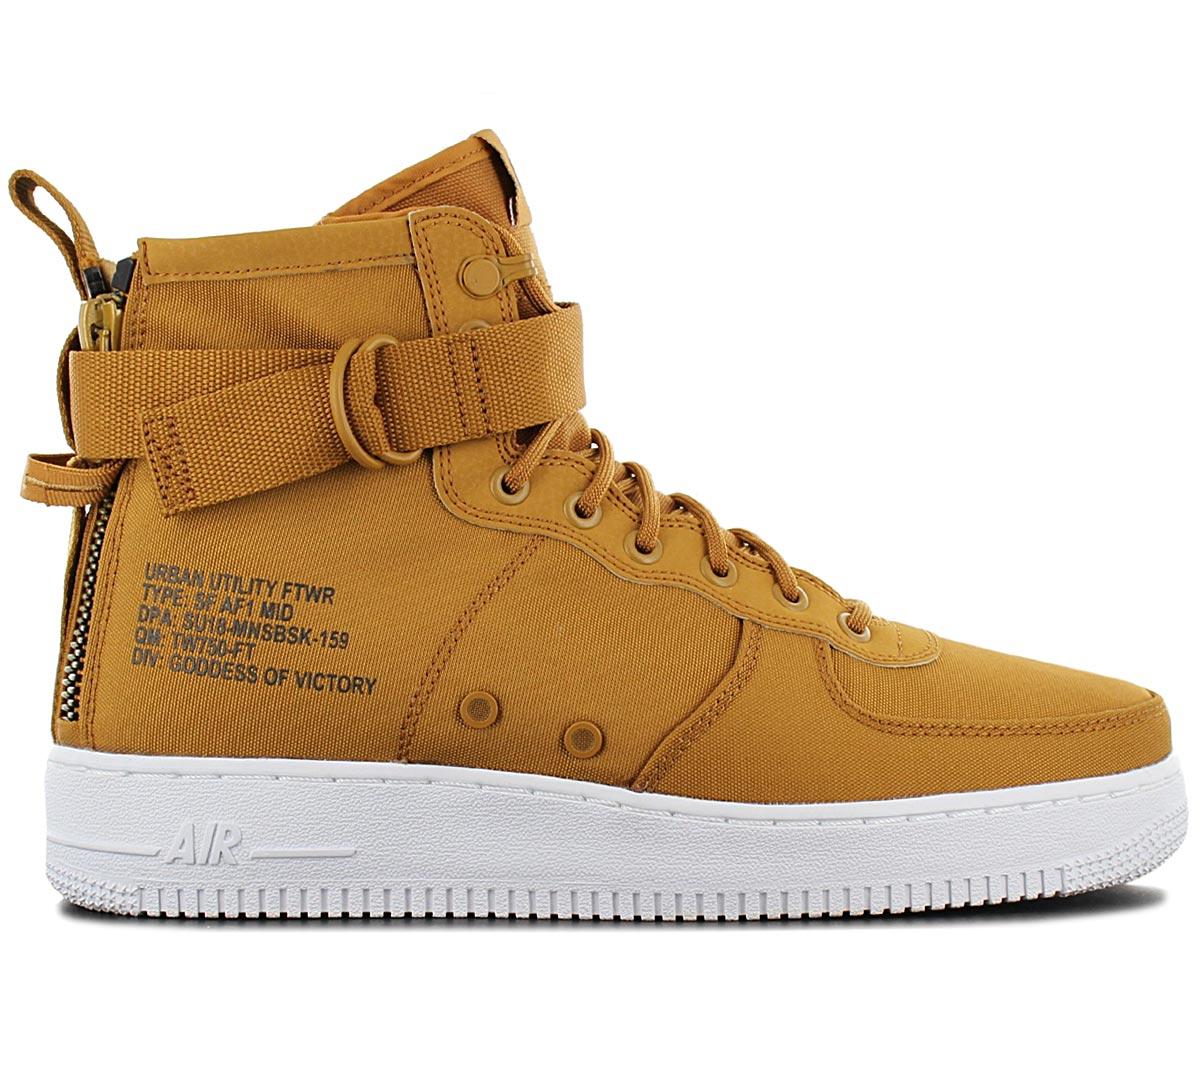 Nike Air Force 1 SF Mid 917753 700 braun, herren, preis